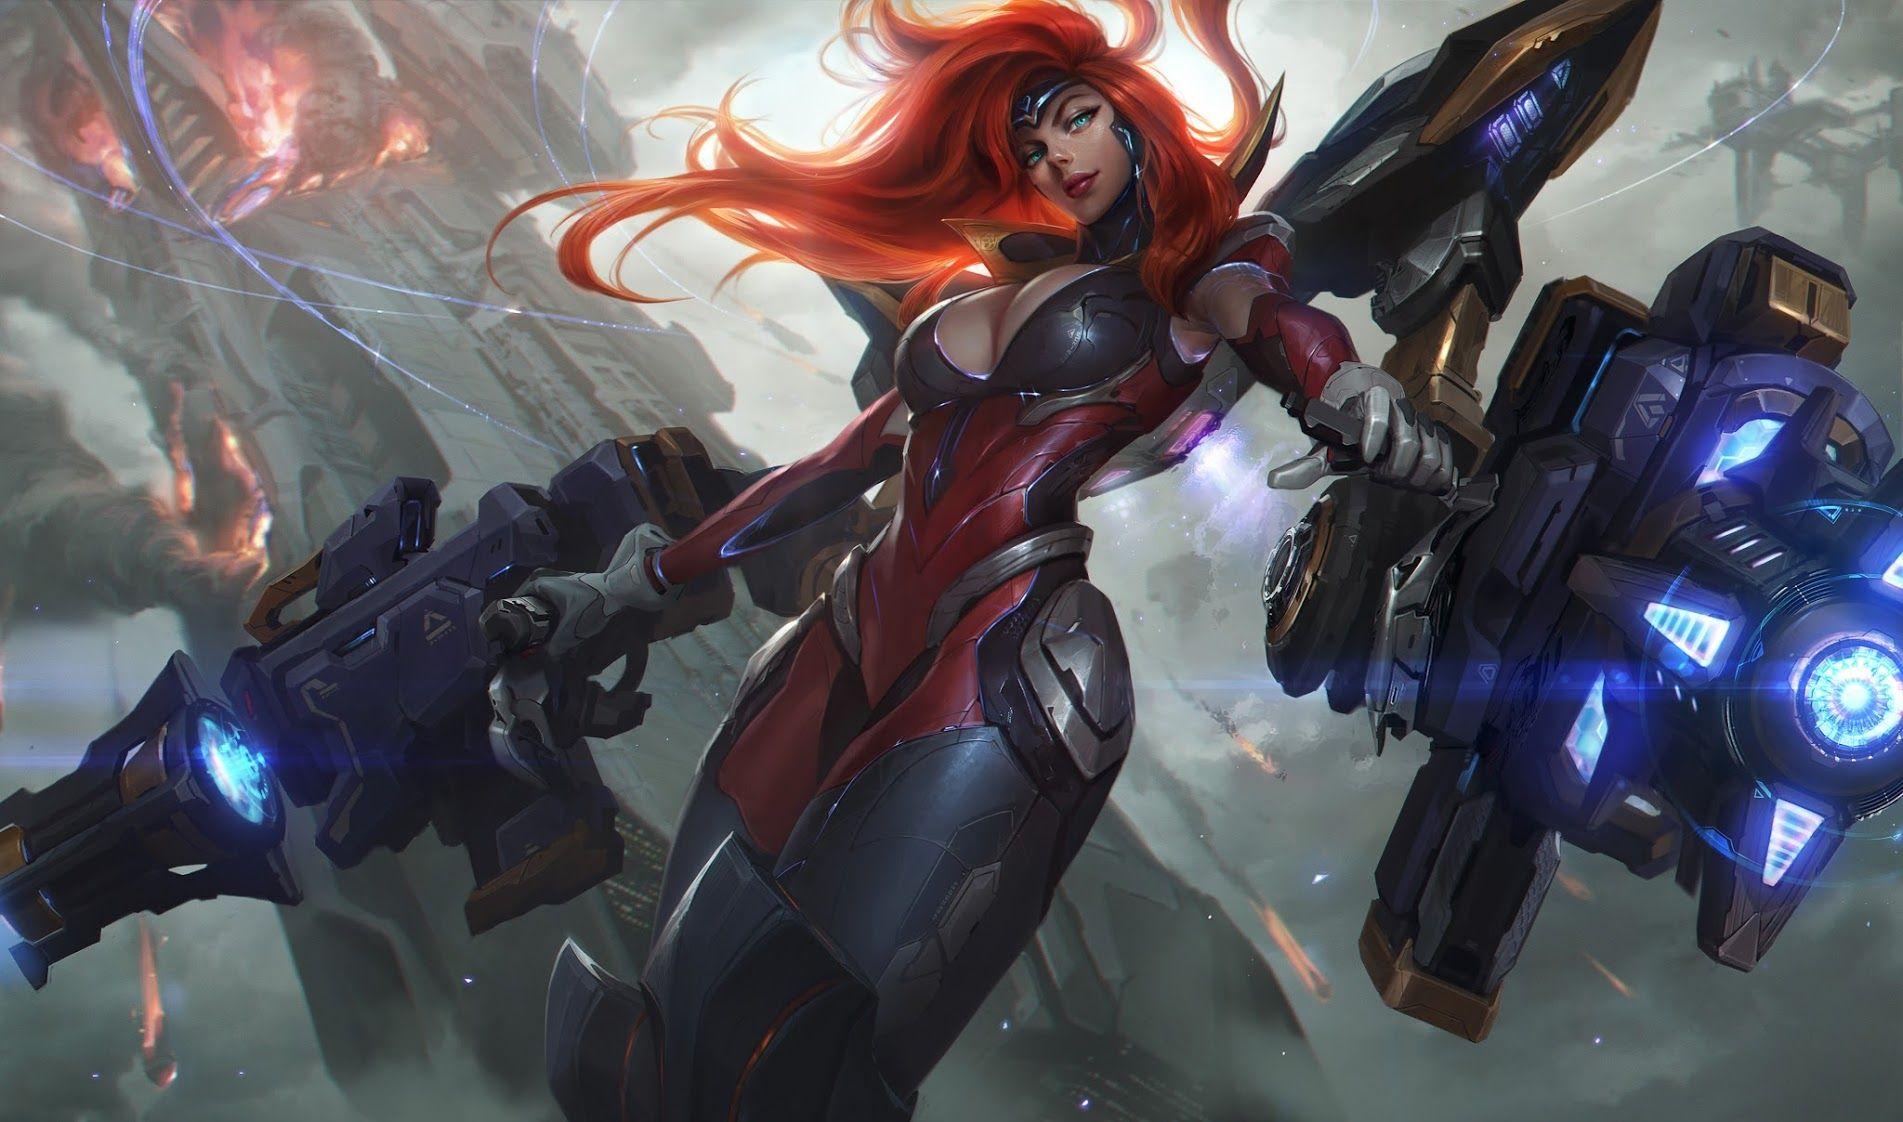 League of Legends' Gun Goddess Miss Fortune Ultimate Skin Revealed